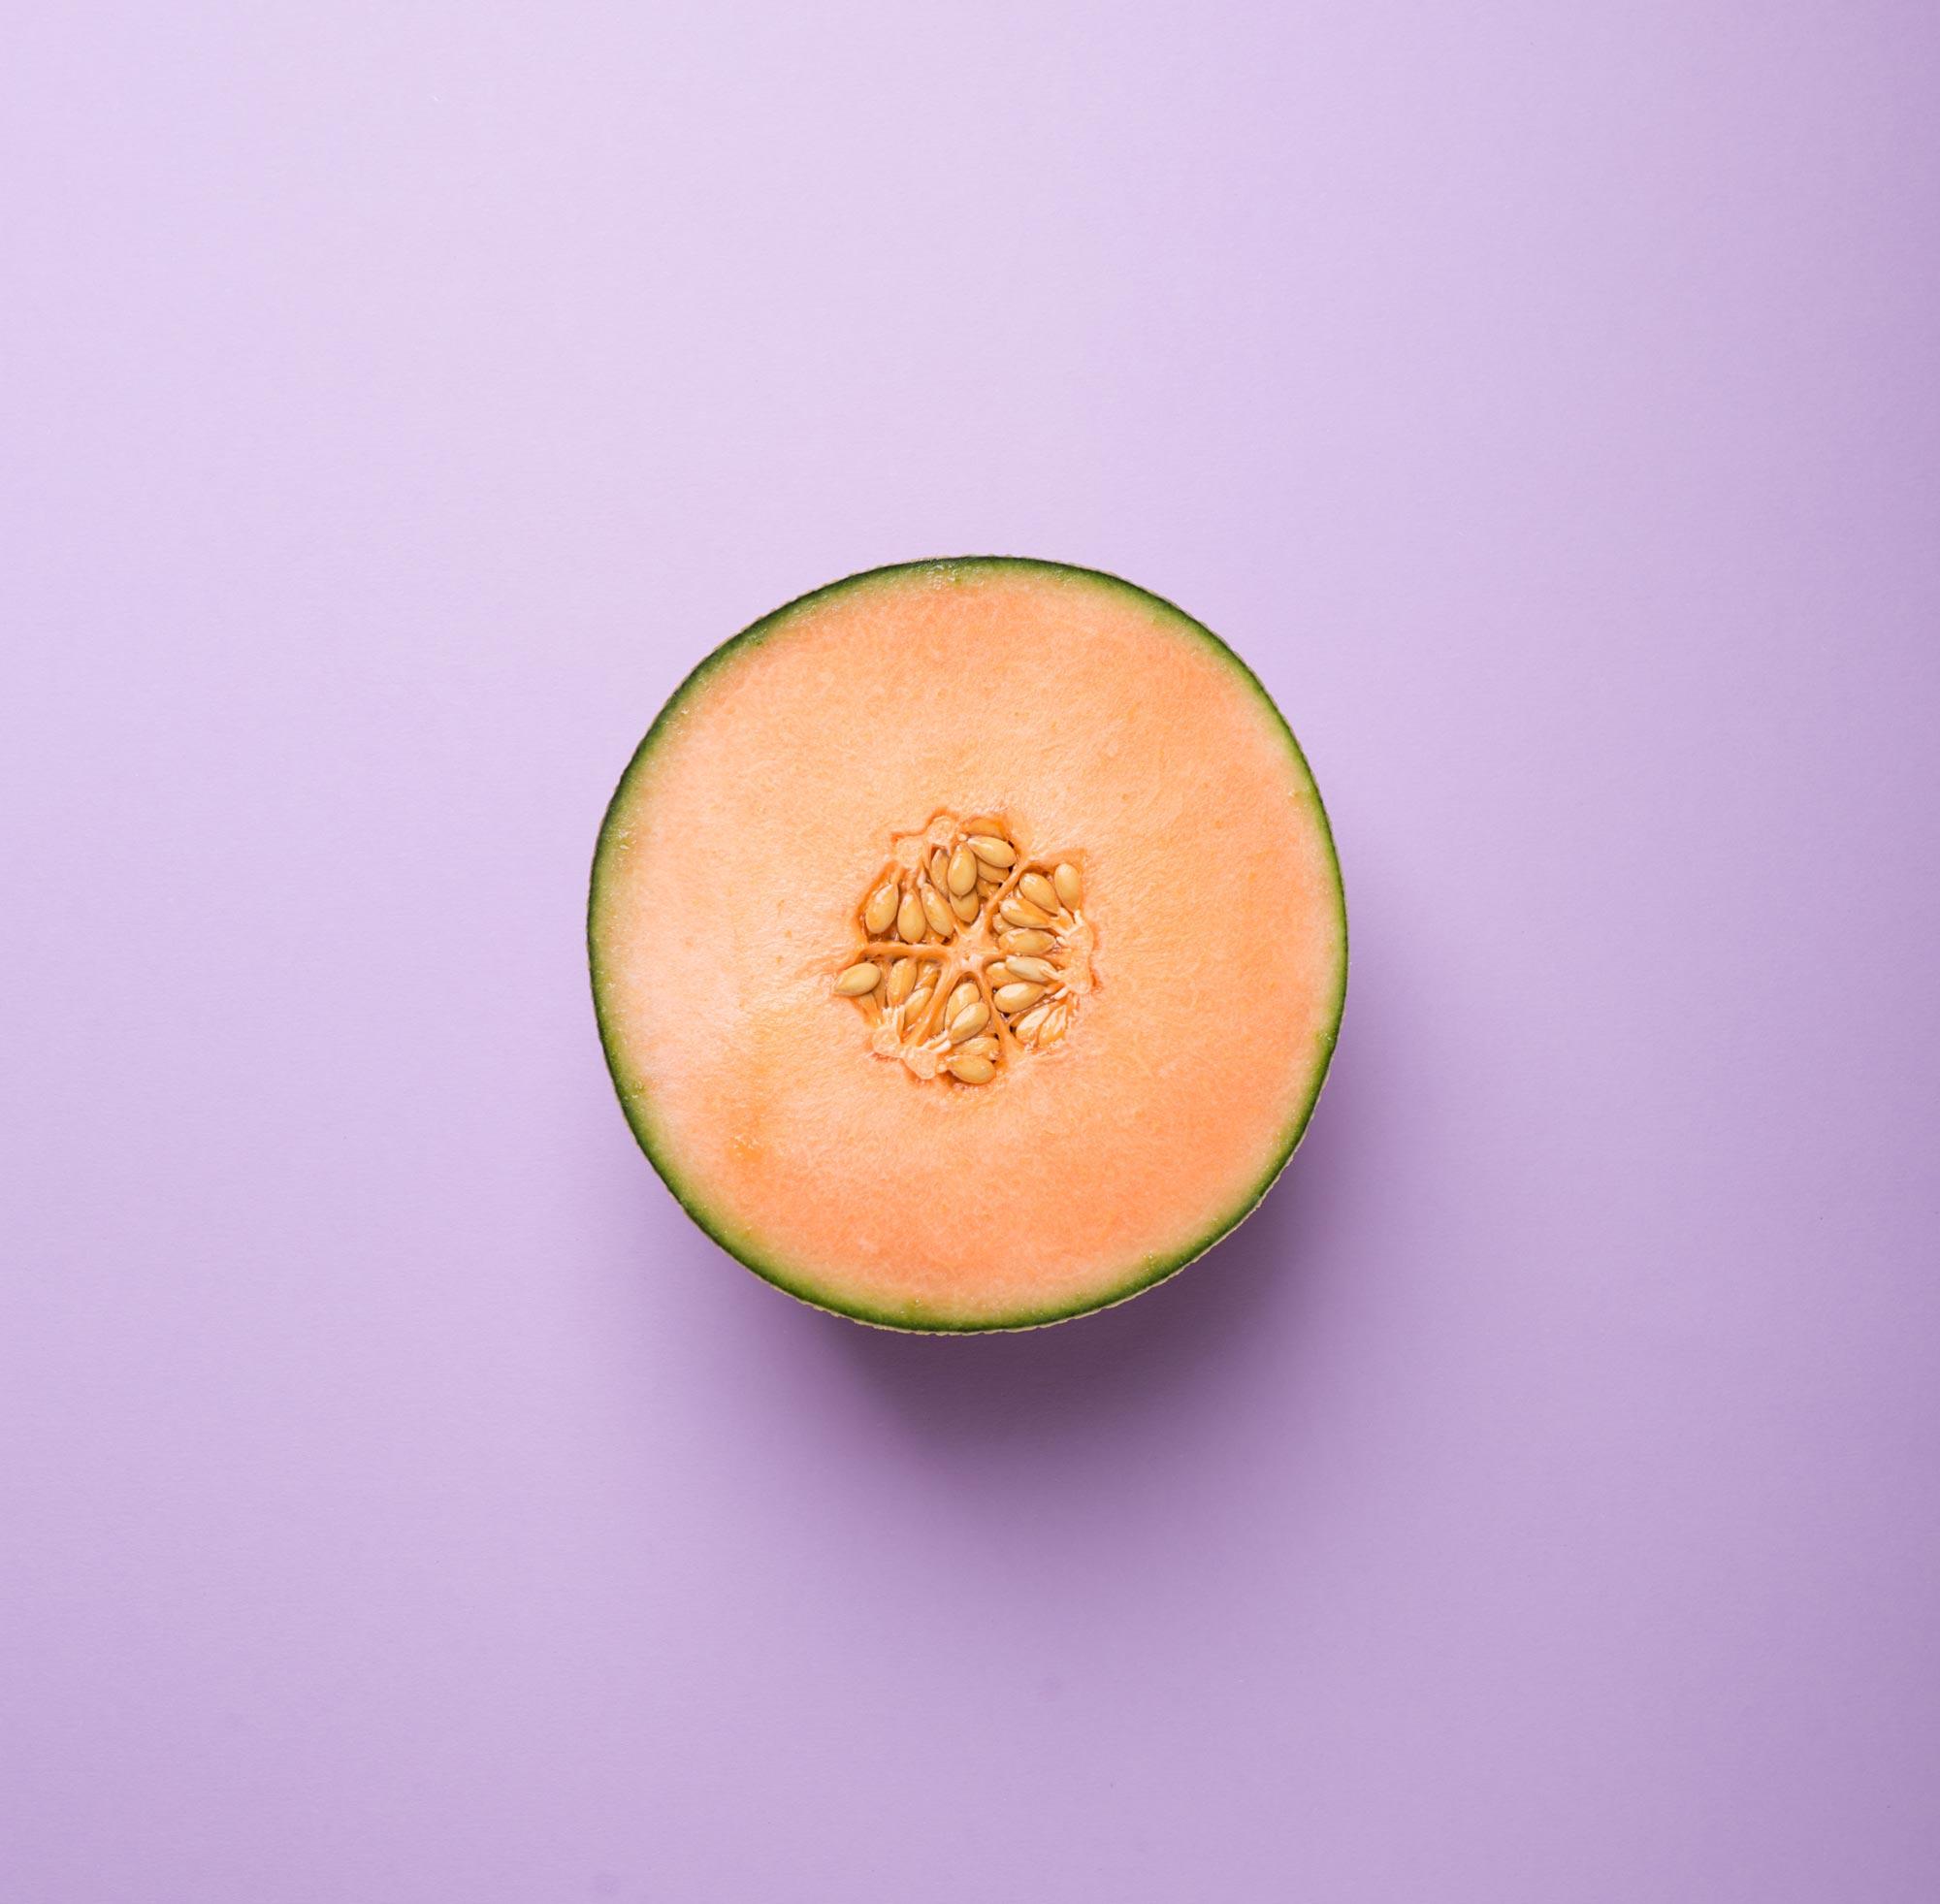 charentais-melon-textbook-plantery.jpg